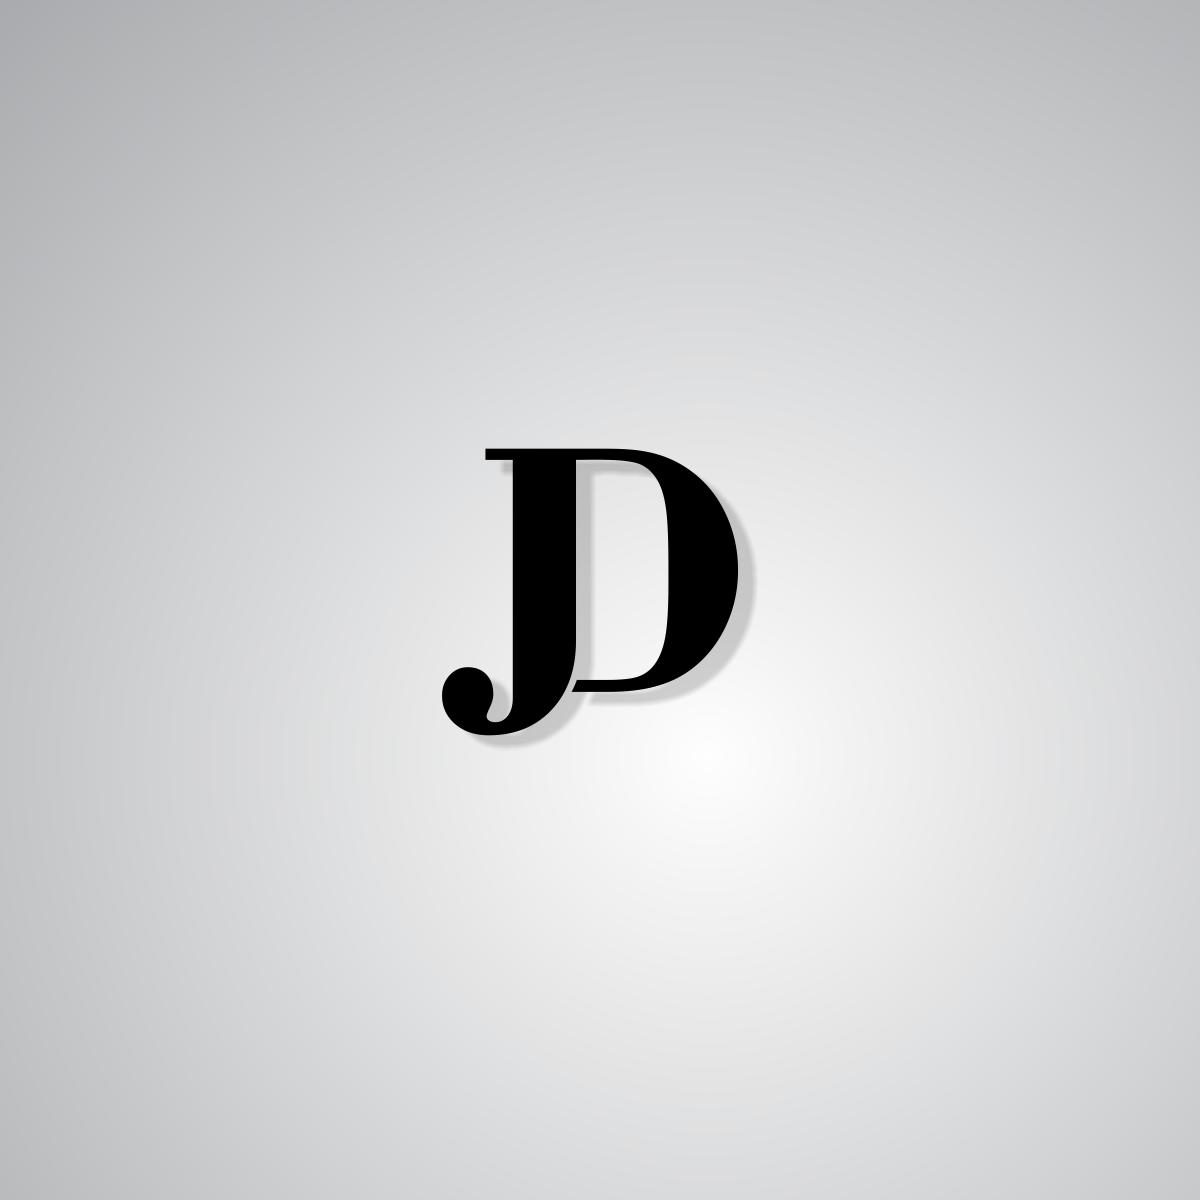 modern masculine it company logo design for jd by victor design 13003732 logo design for jd by victor